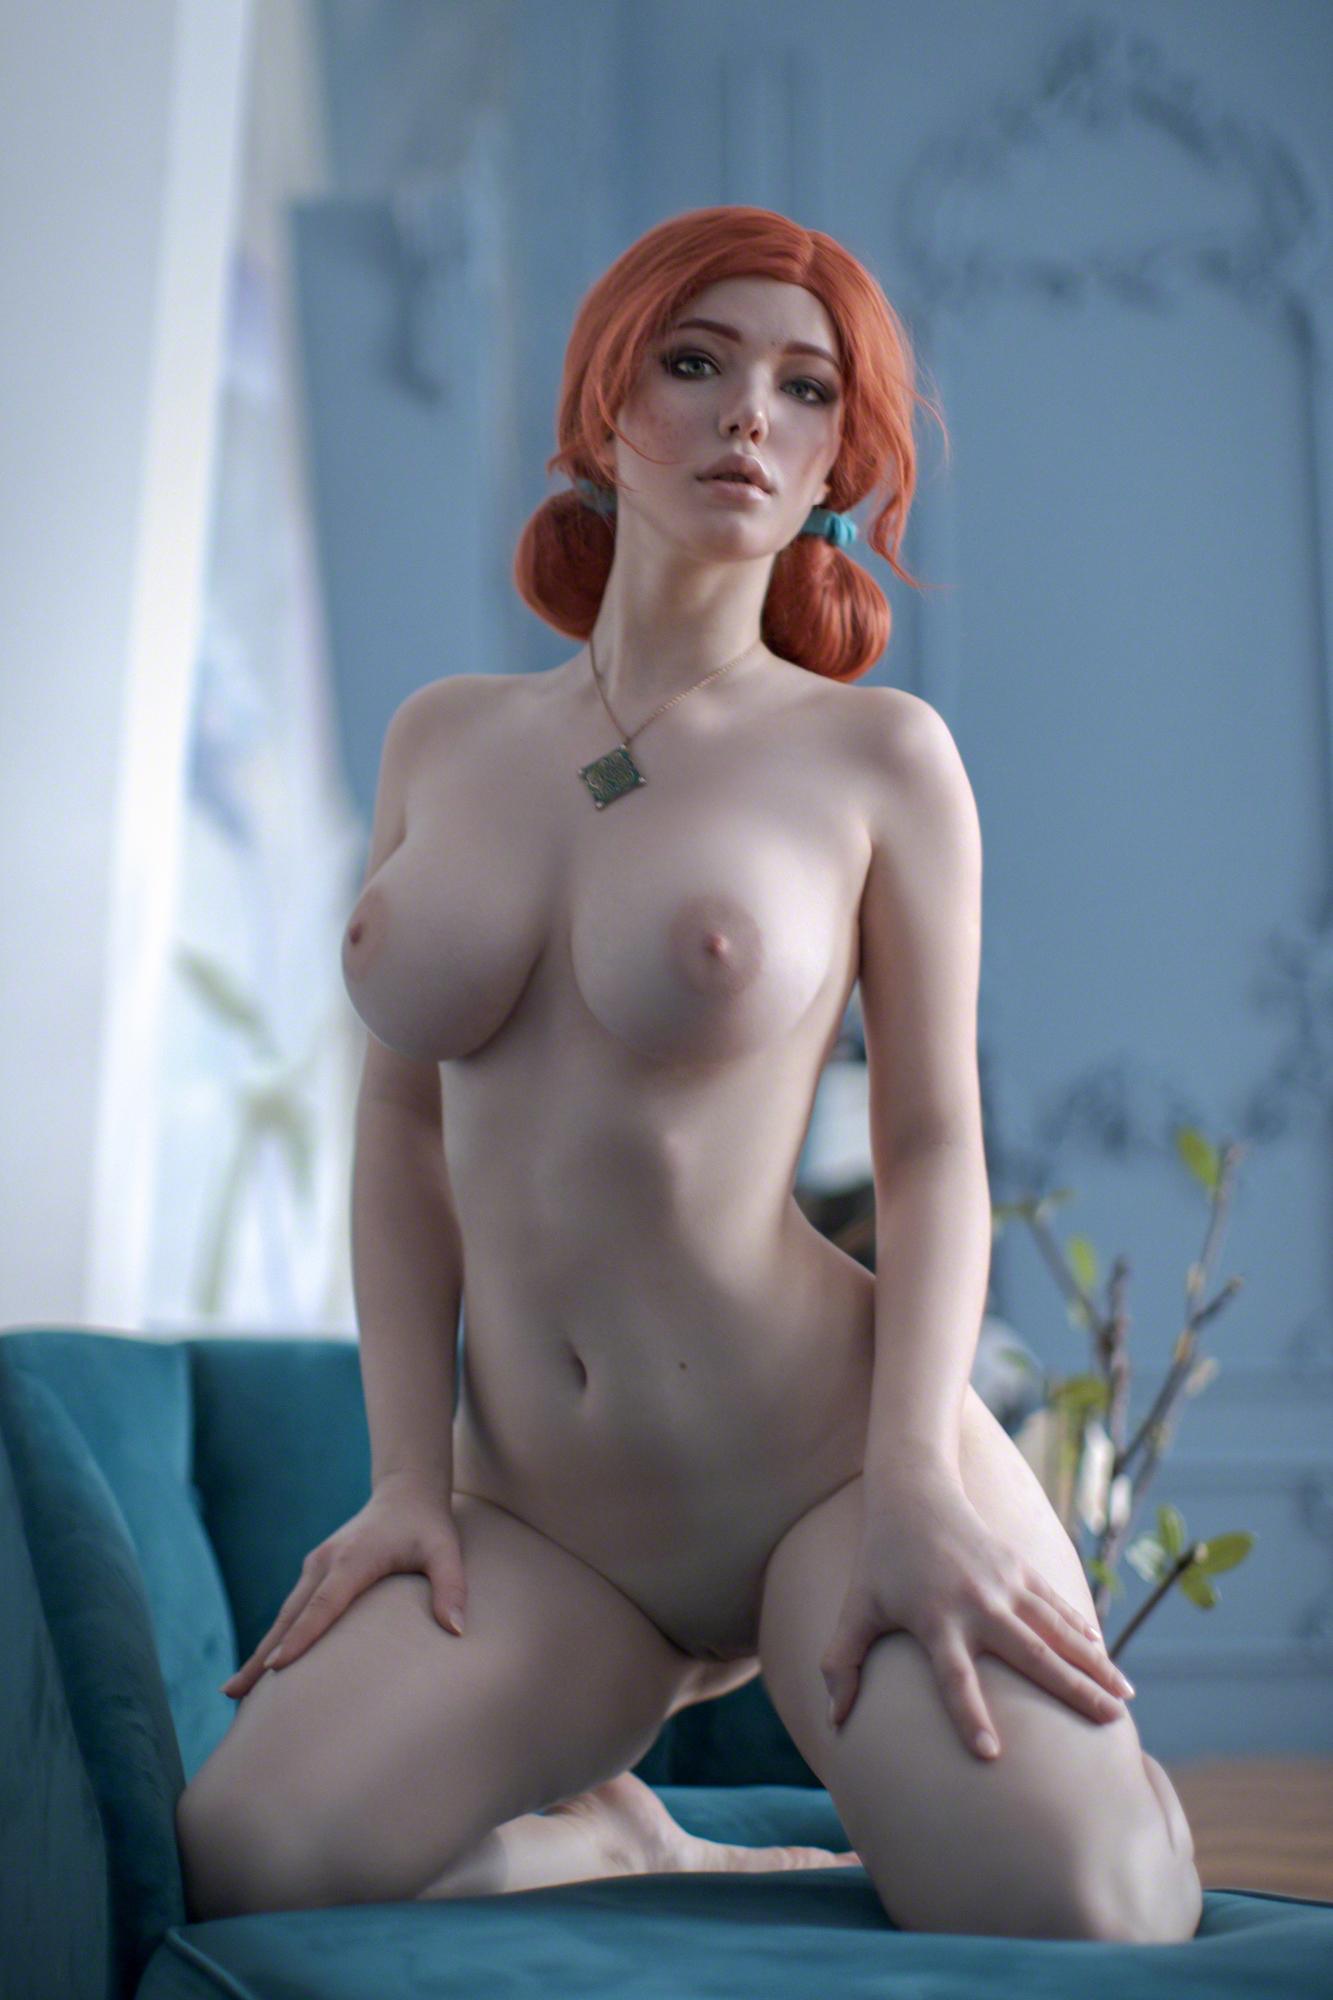 Leaked Nude Set From Lada Lyumos Patreon 0034